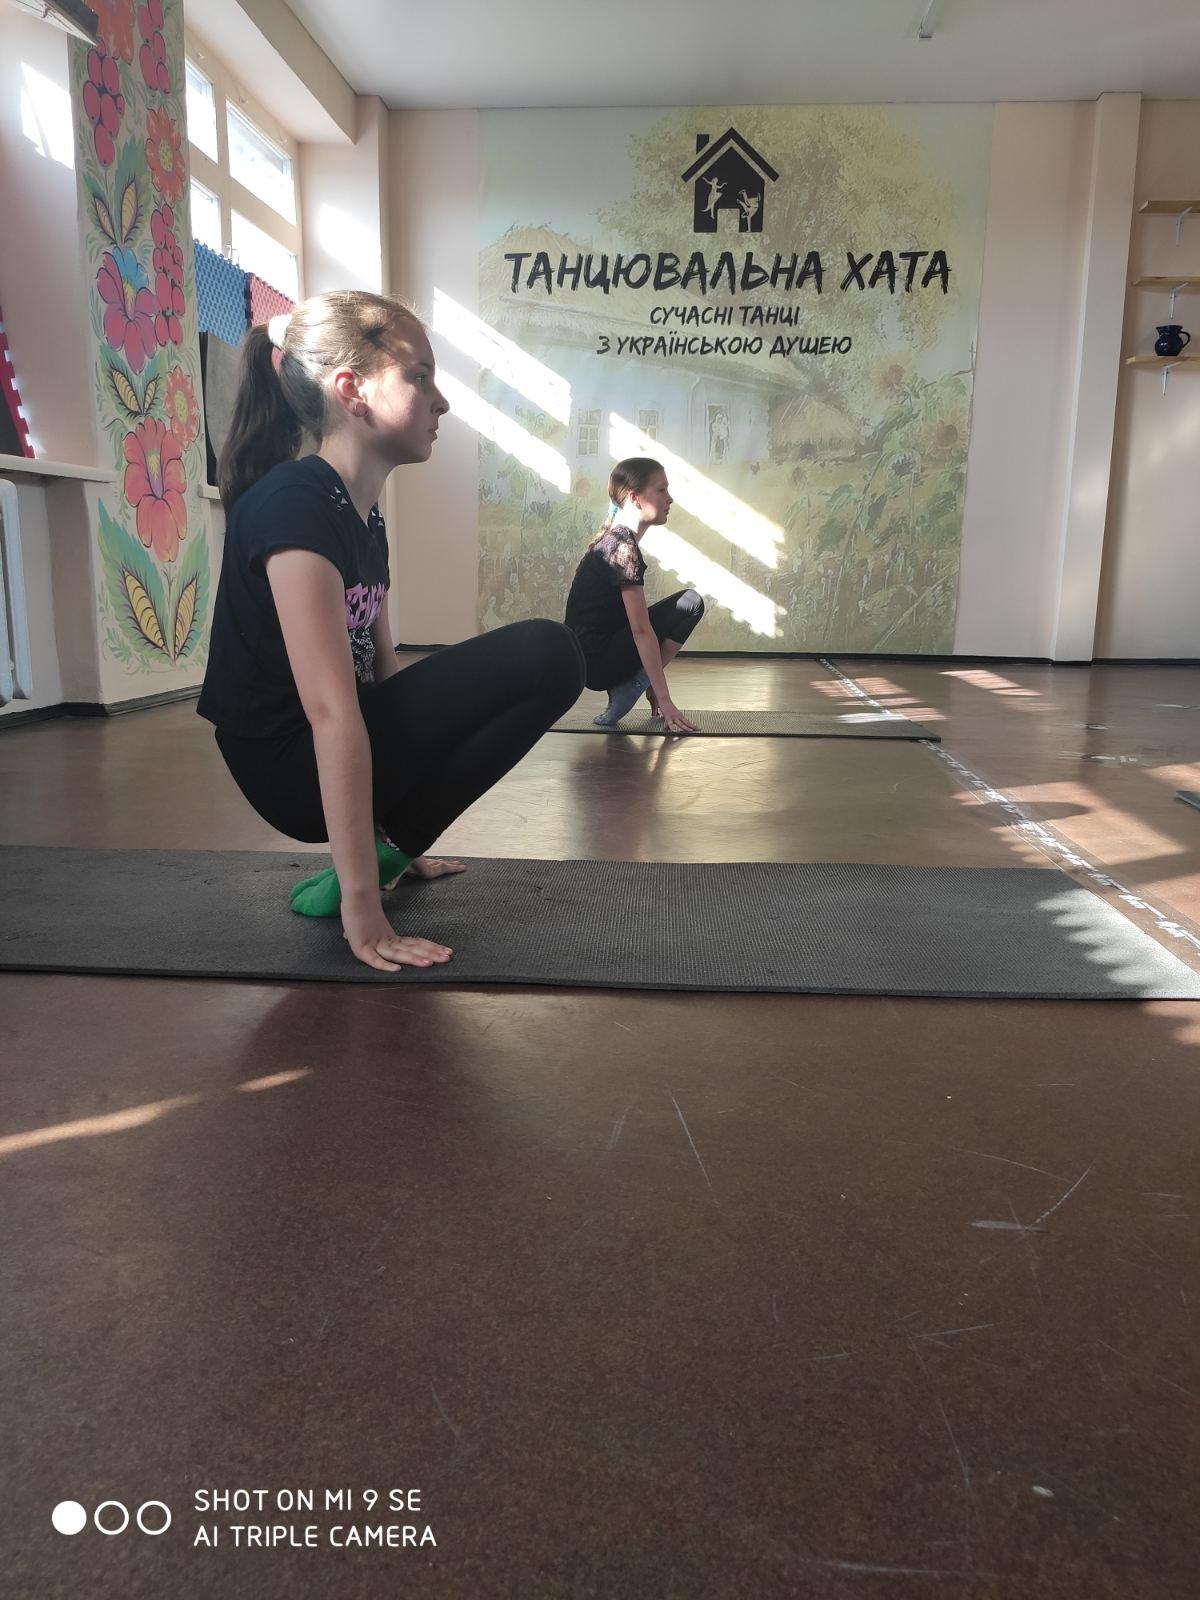 Танцы в Лозовой от А до Я: куда, когда и как?, фото-59